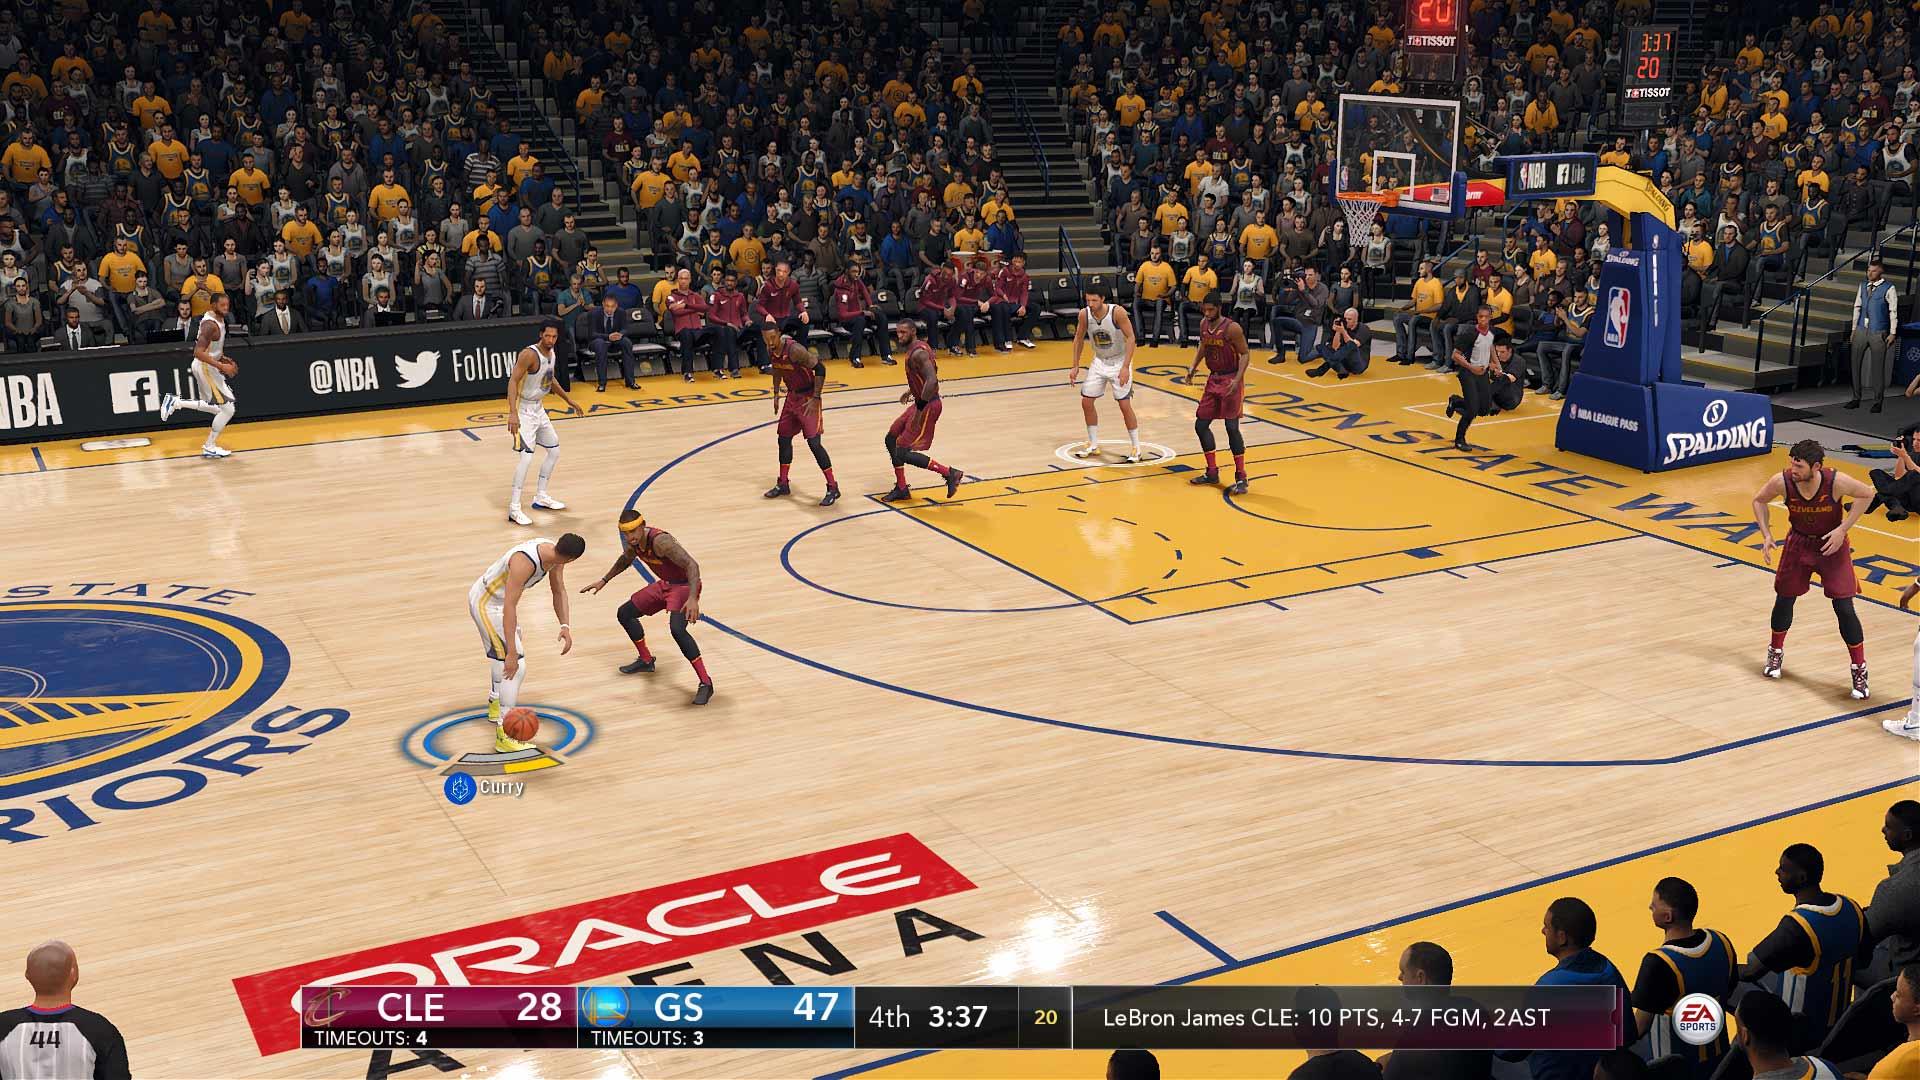 Análisis de NBA Live 18 - Xbox One 2